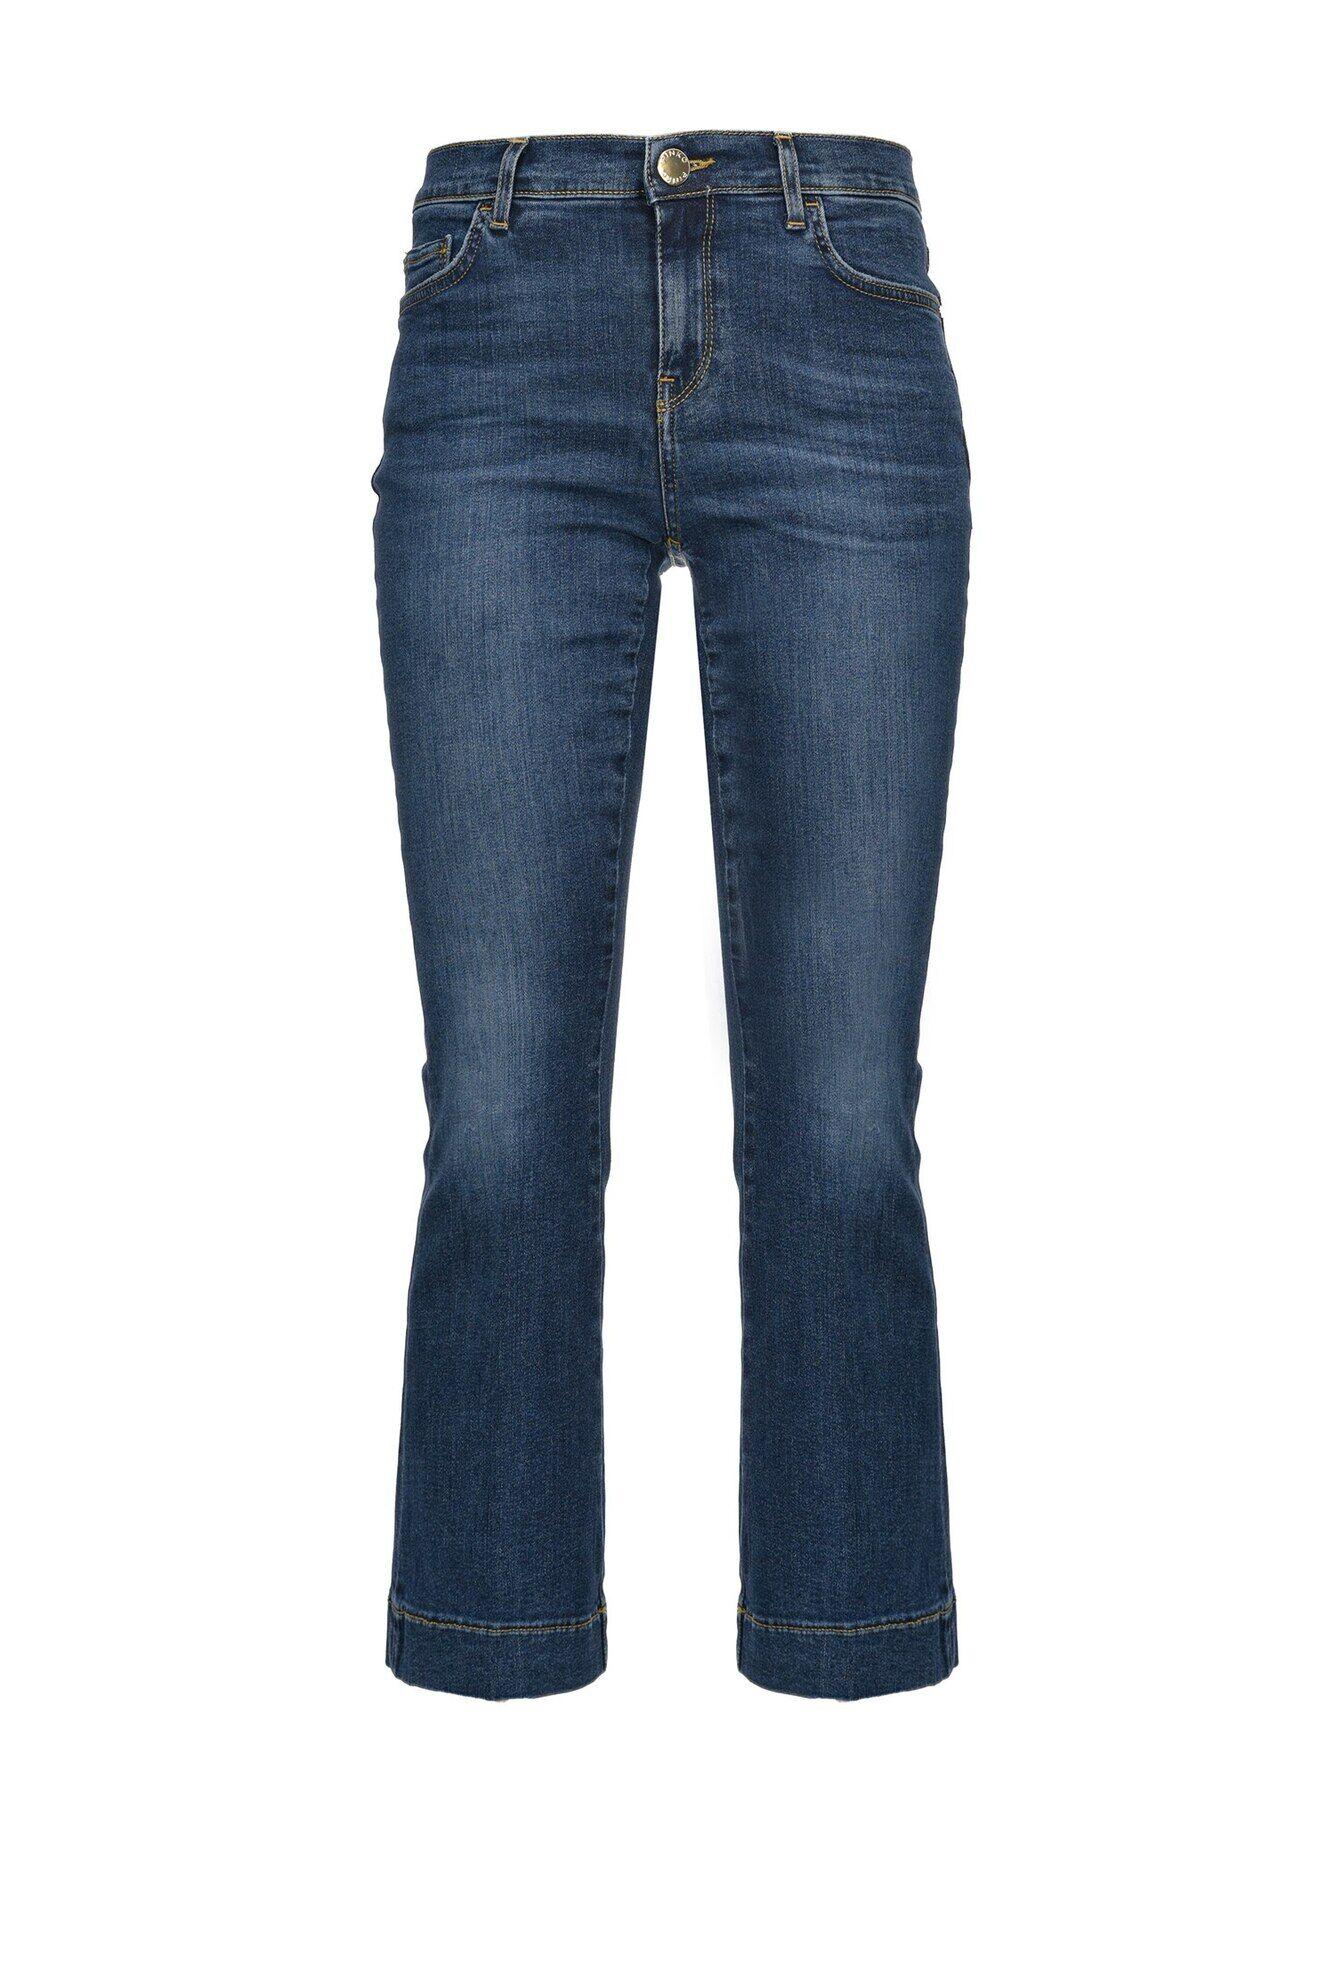 Jeans Flare In Denim Twill Stretch - Pinko